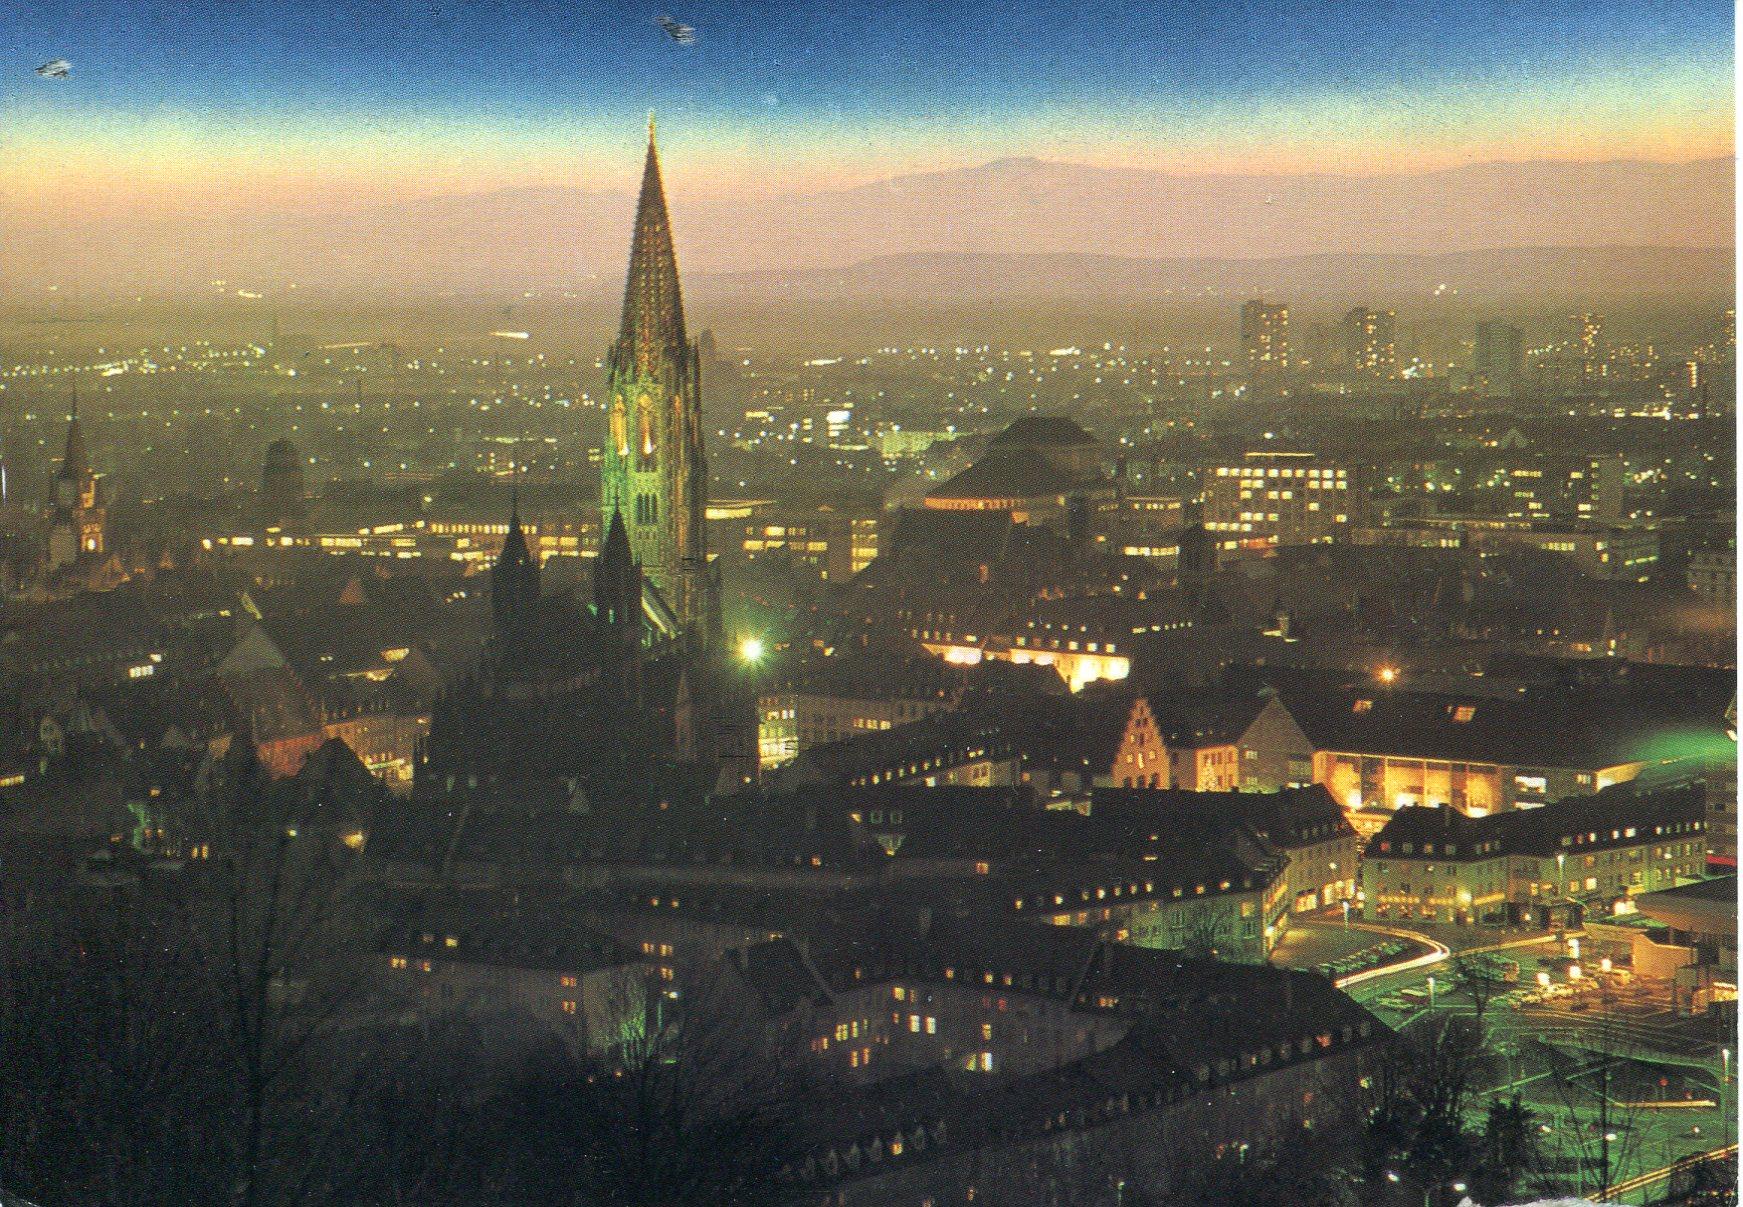 Freiburg im Breisgau Germany  city photos : Freiburg im Breisgau, Germany | Remembering Letters and Postcards